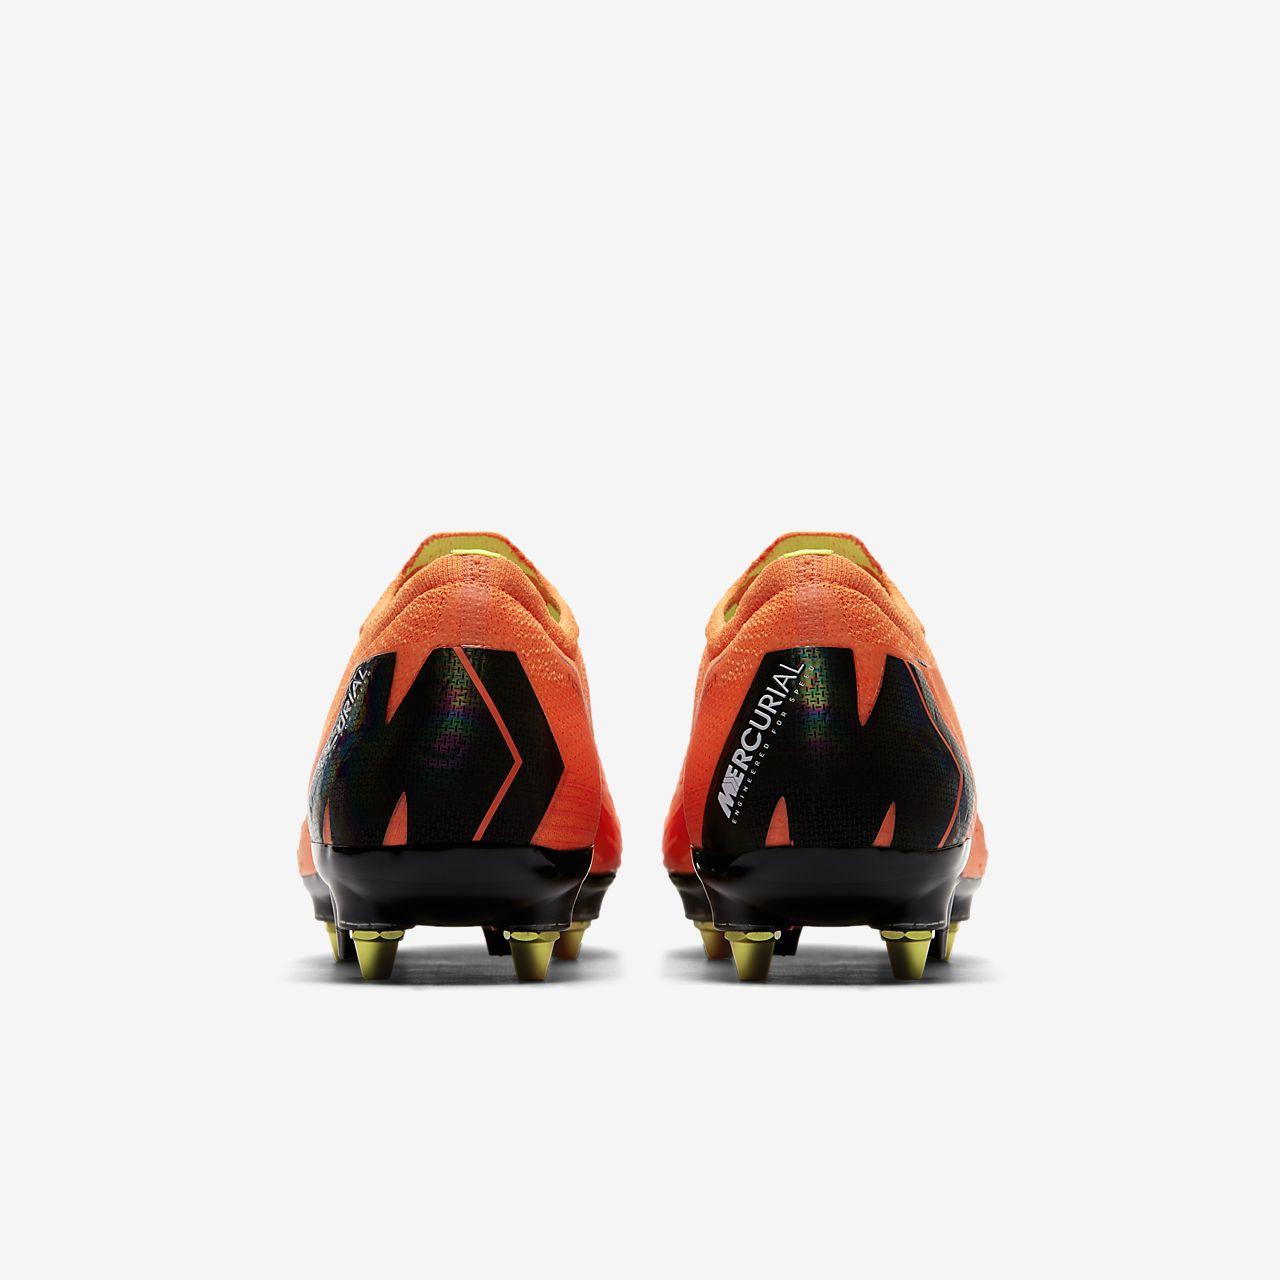 Scarpa da calcio per terreni morbidi Nike Mercurial Vapor 360 Elite SG-PRO Anti-Clog